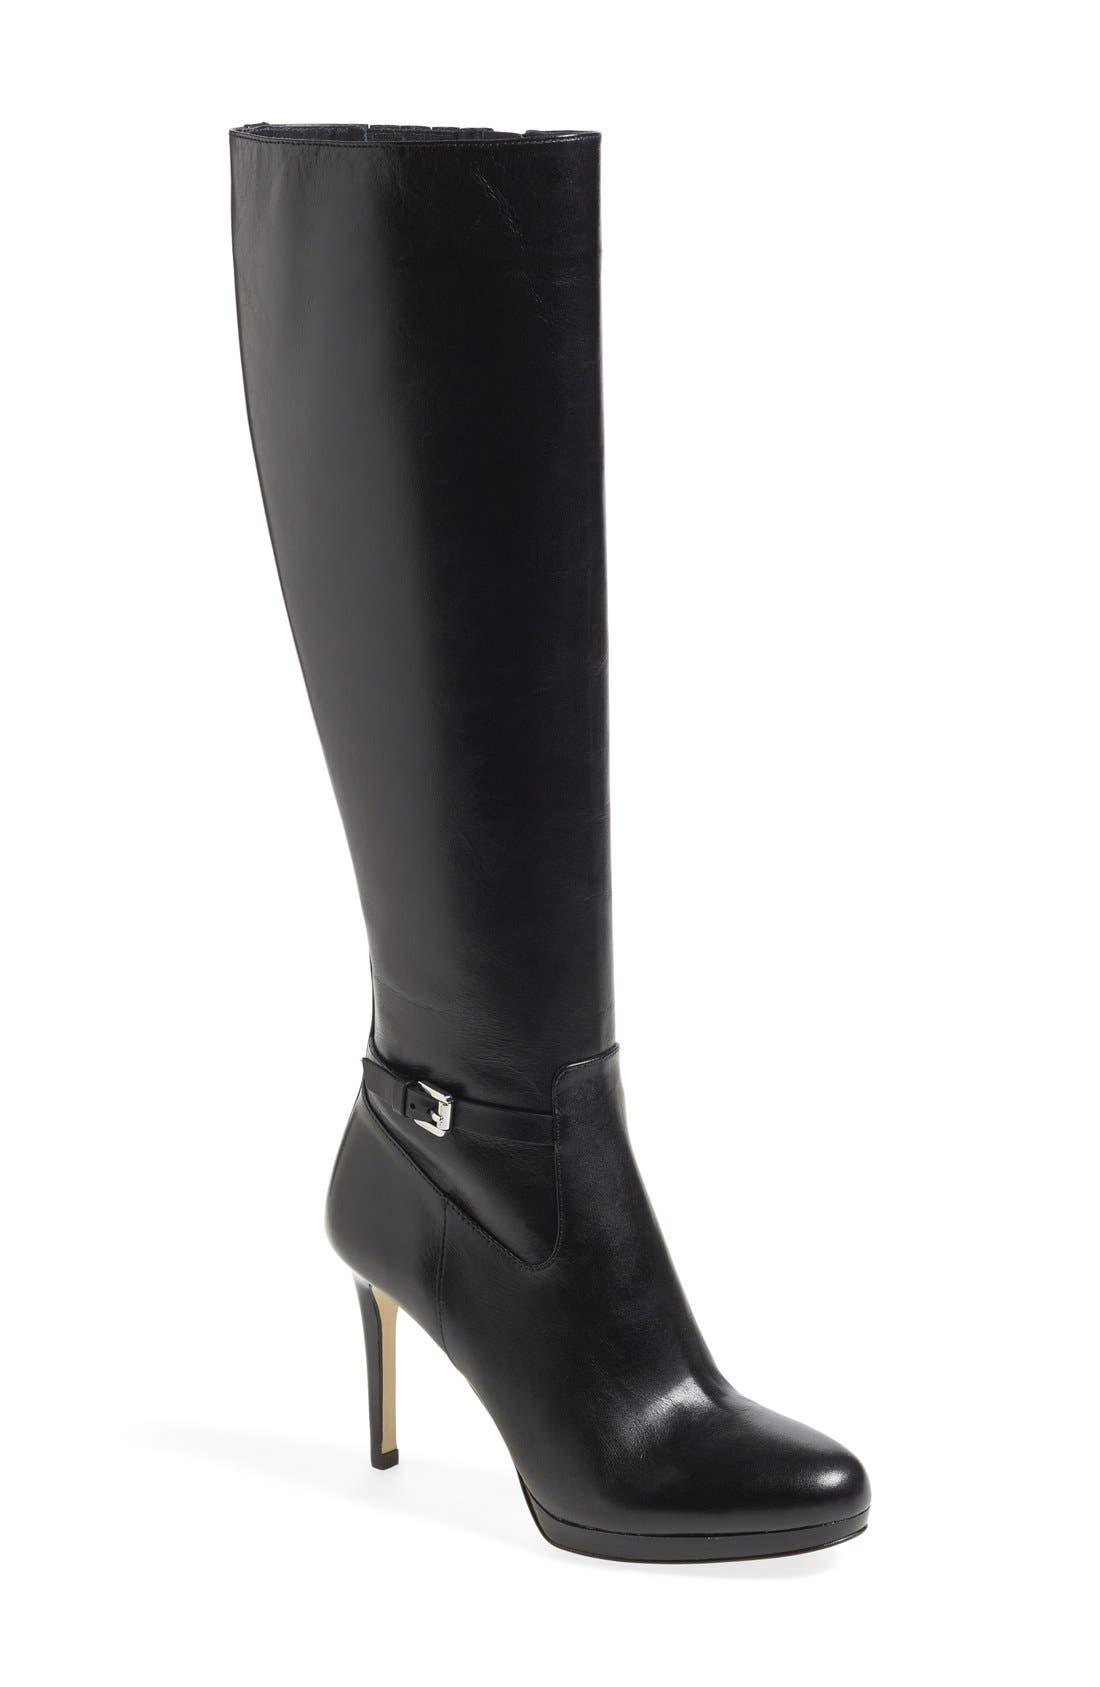 Alternate Image 1 Selected - MICHAEL Michael Kors 'Woods' Knee High Platform Boot (Women) (Nordstrom Exclusive)